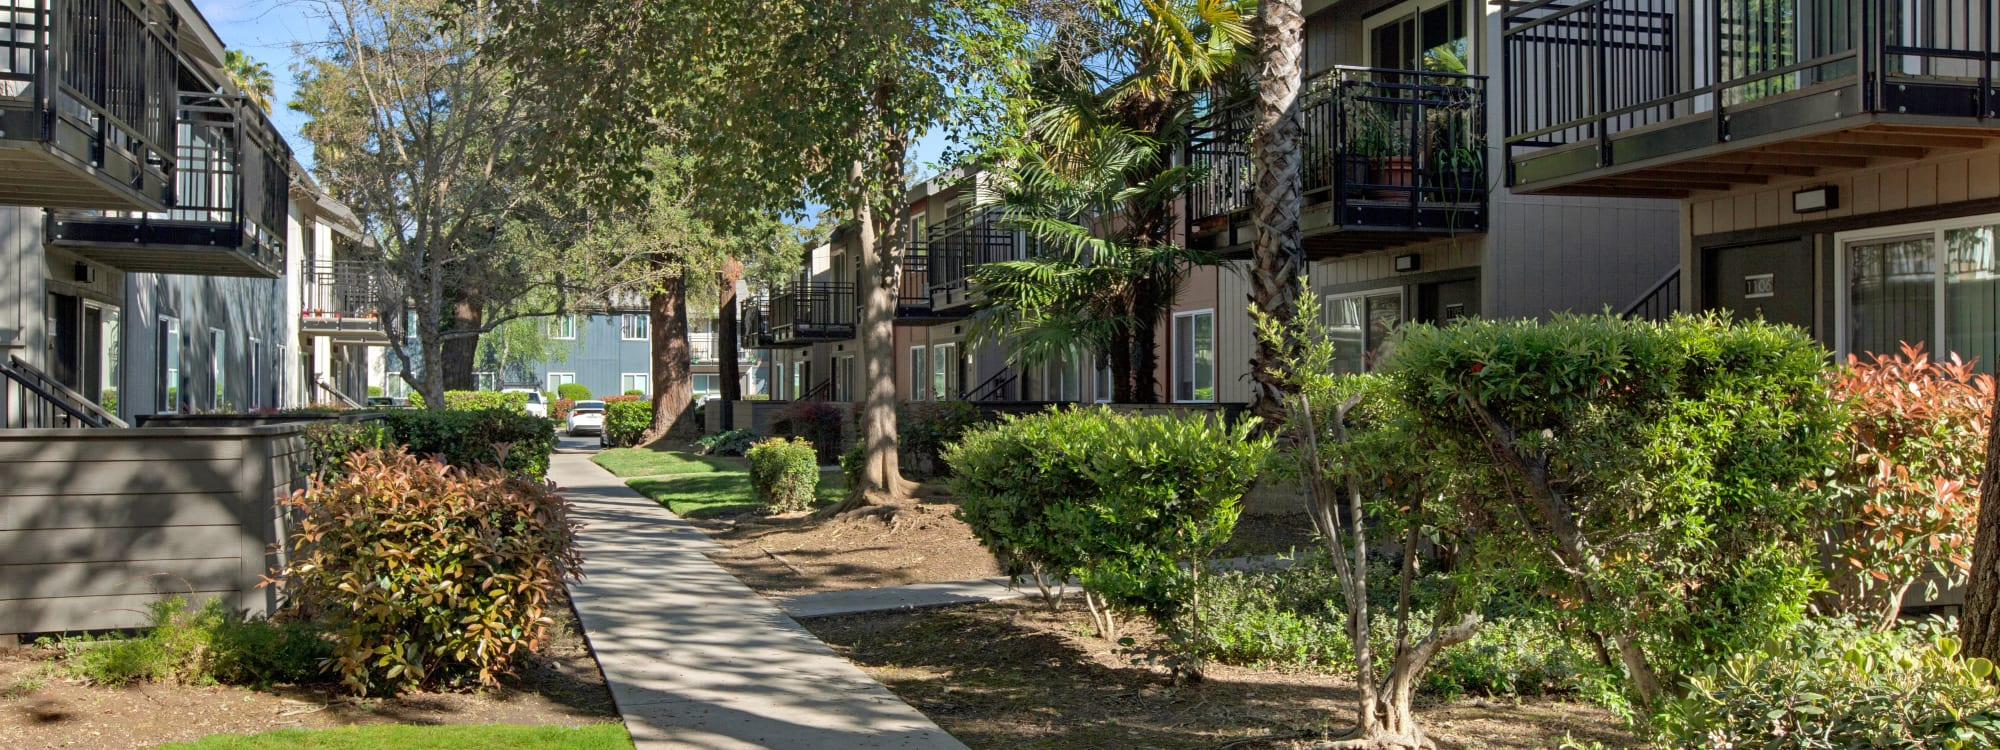 Neighborhood near The Archer in Sacramento, California